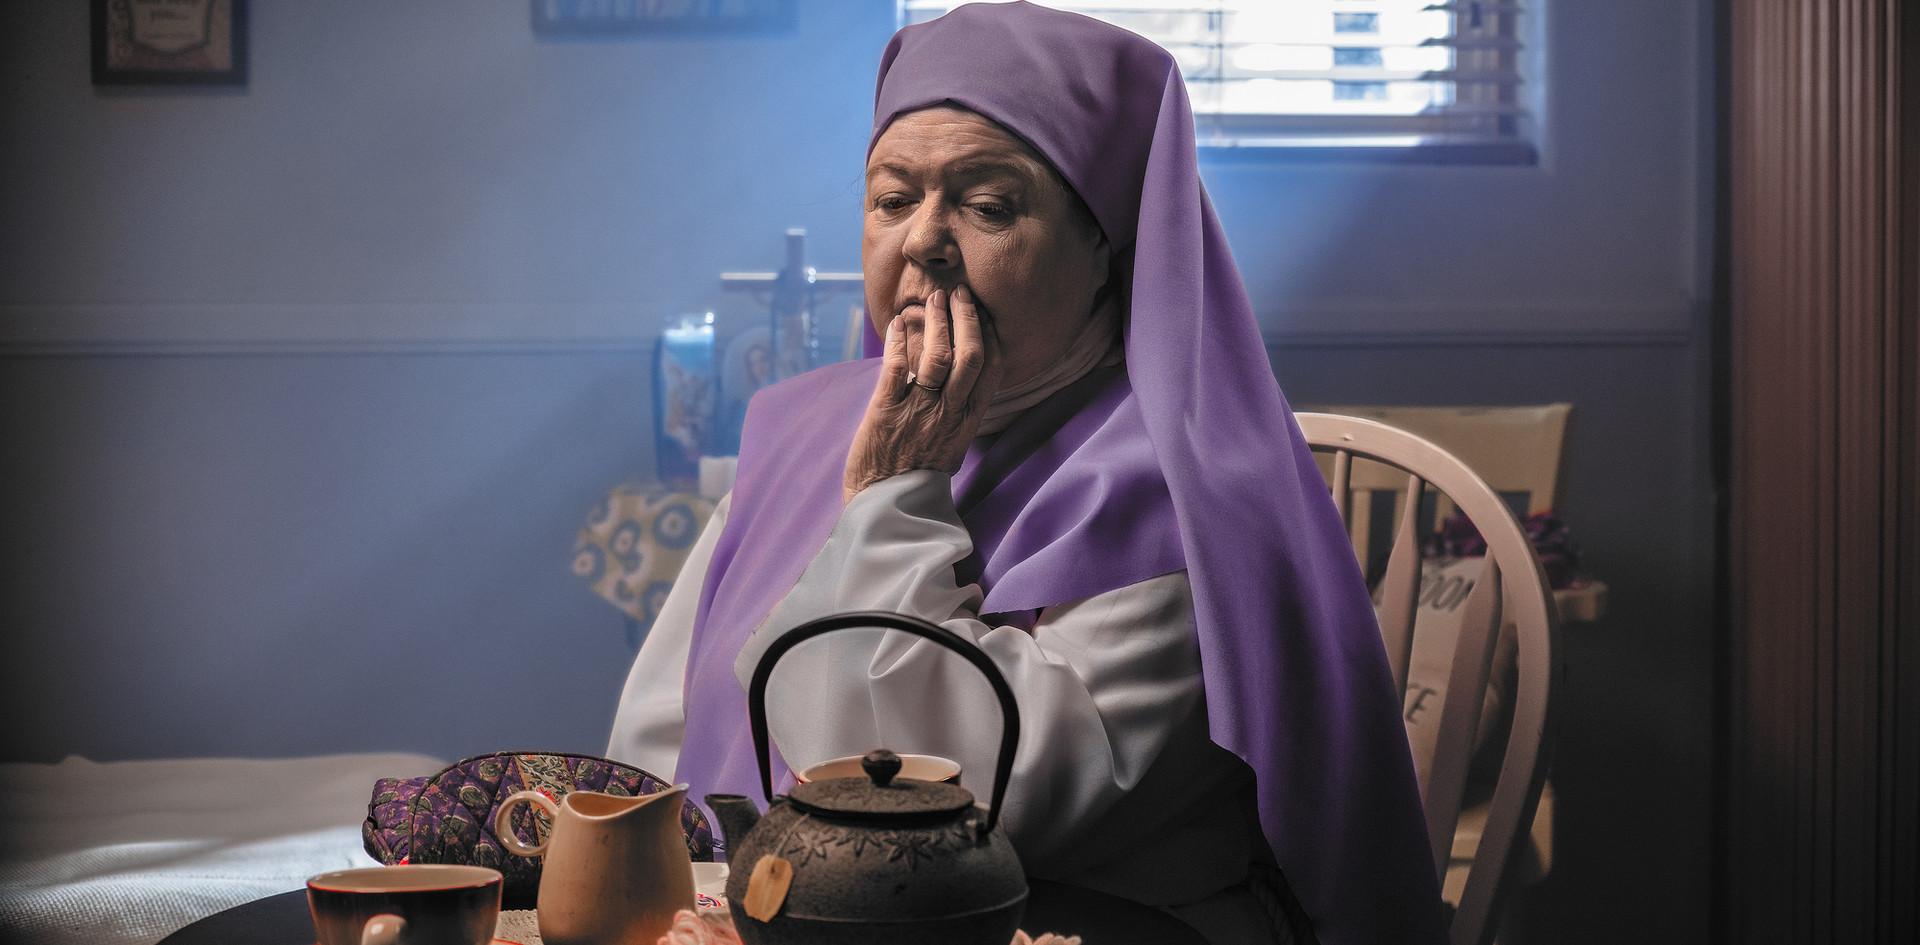 Sister Beatrice